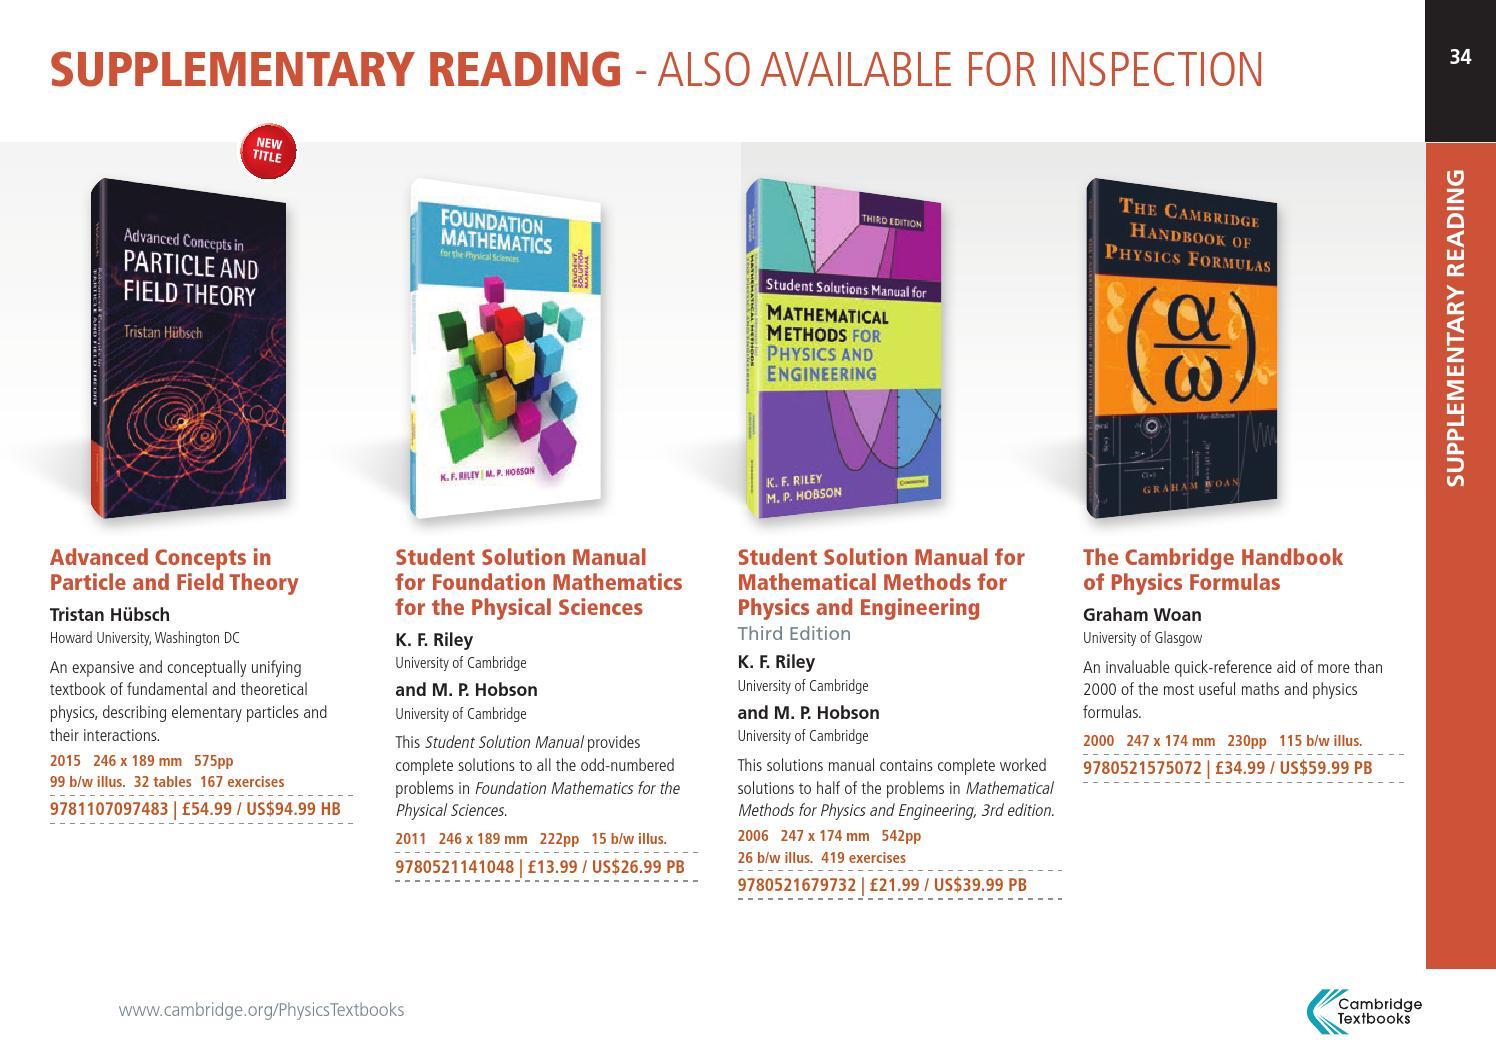 Physics Textbooks from Cambridge by Cambridge University